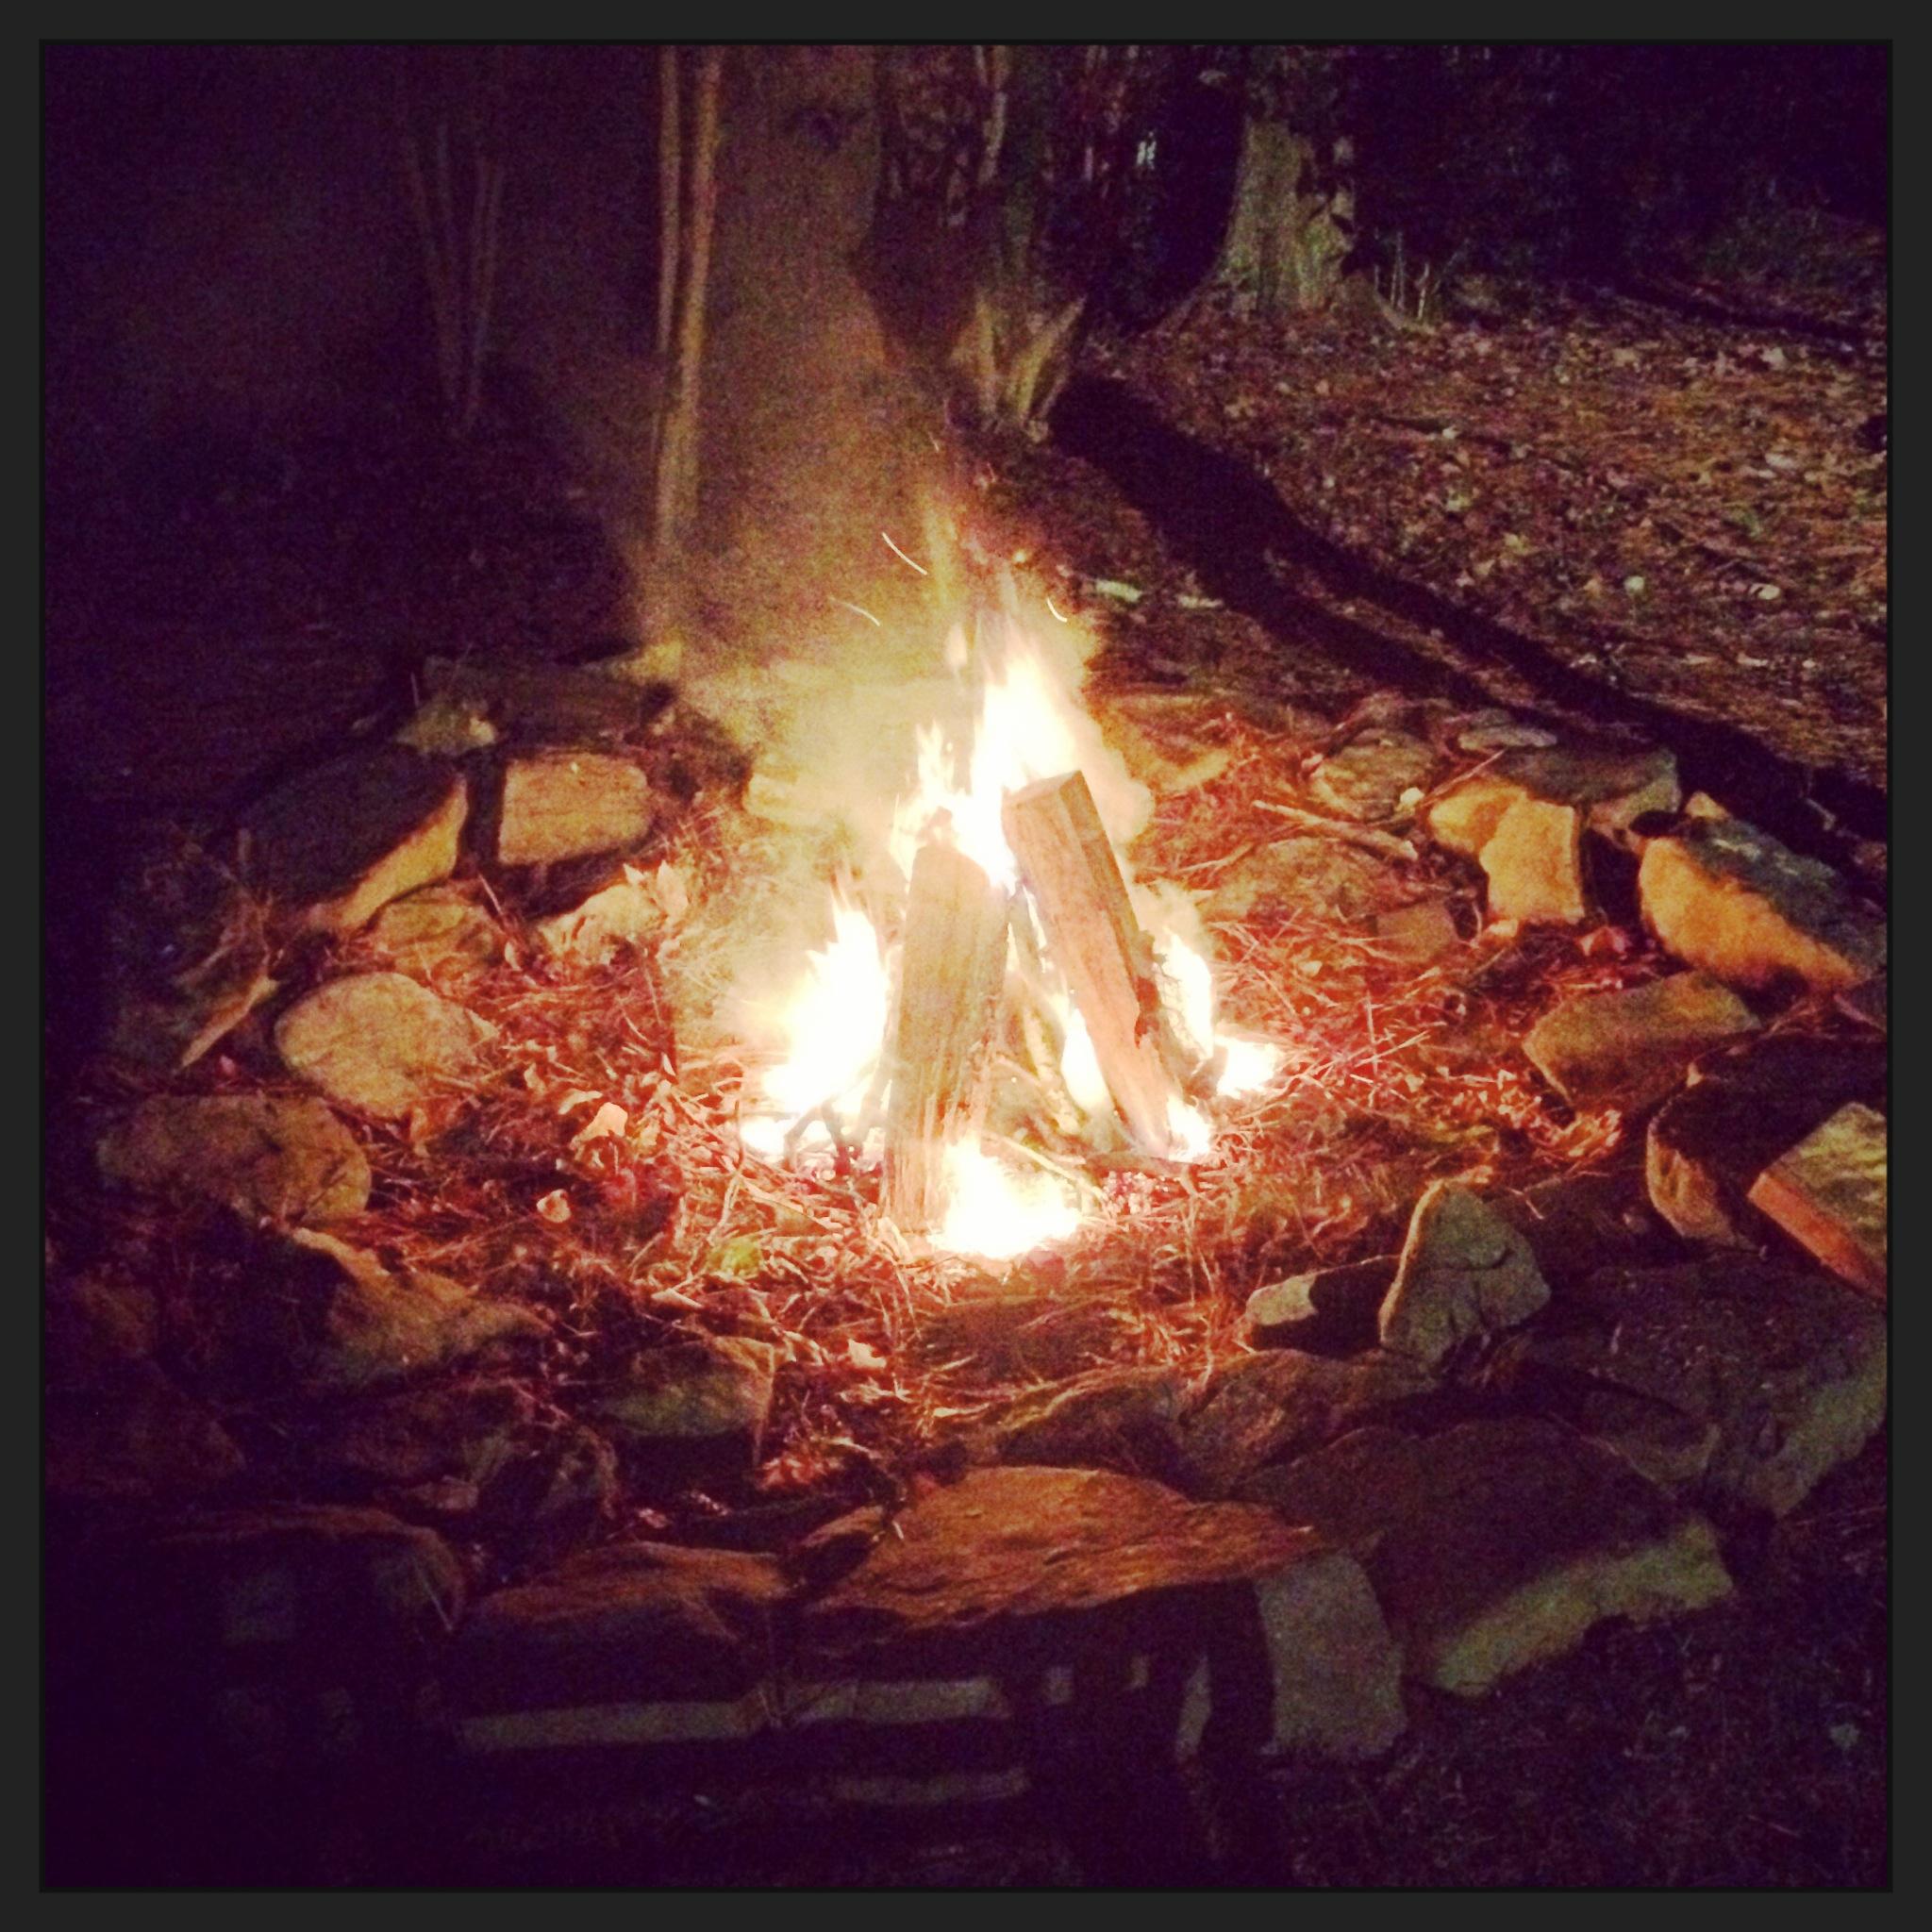 bonfire-asimplerdesign